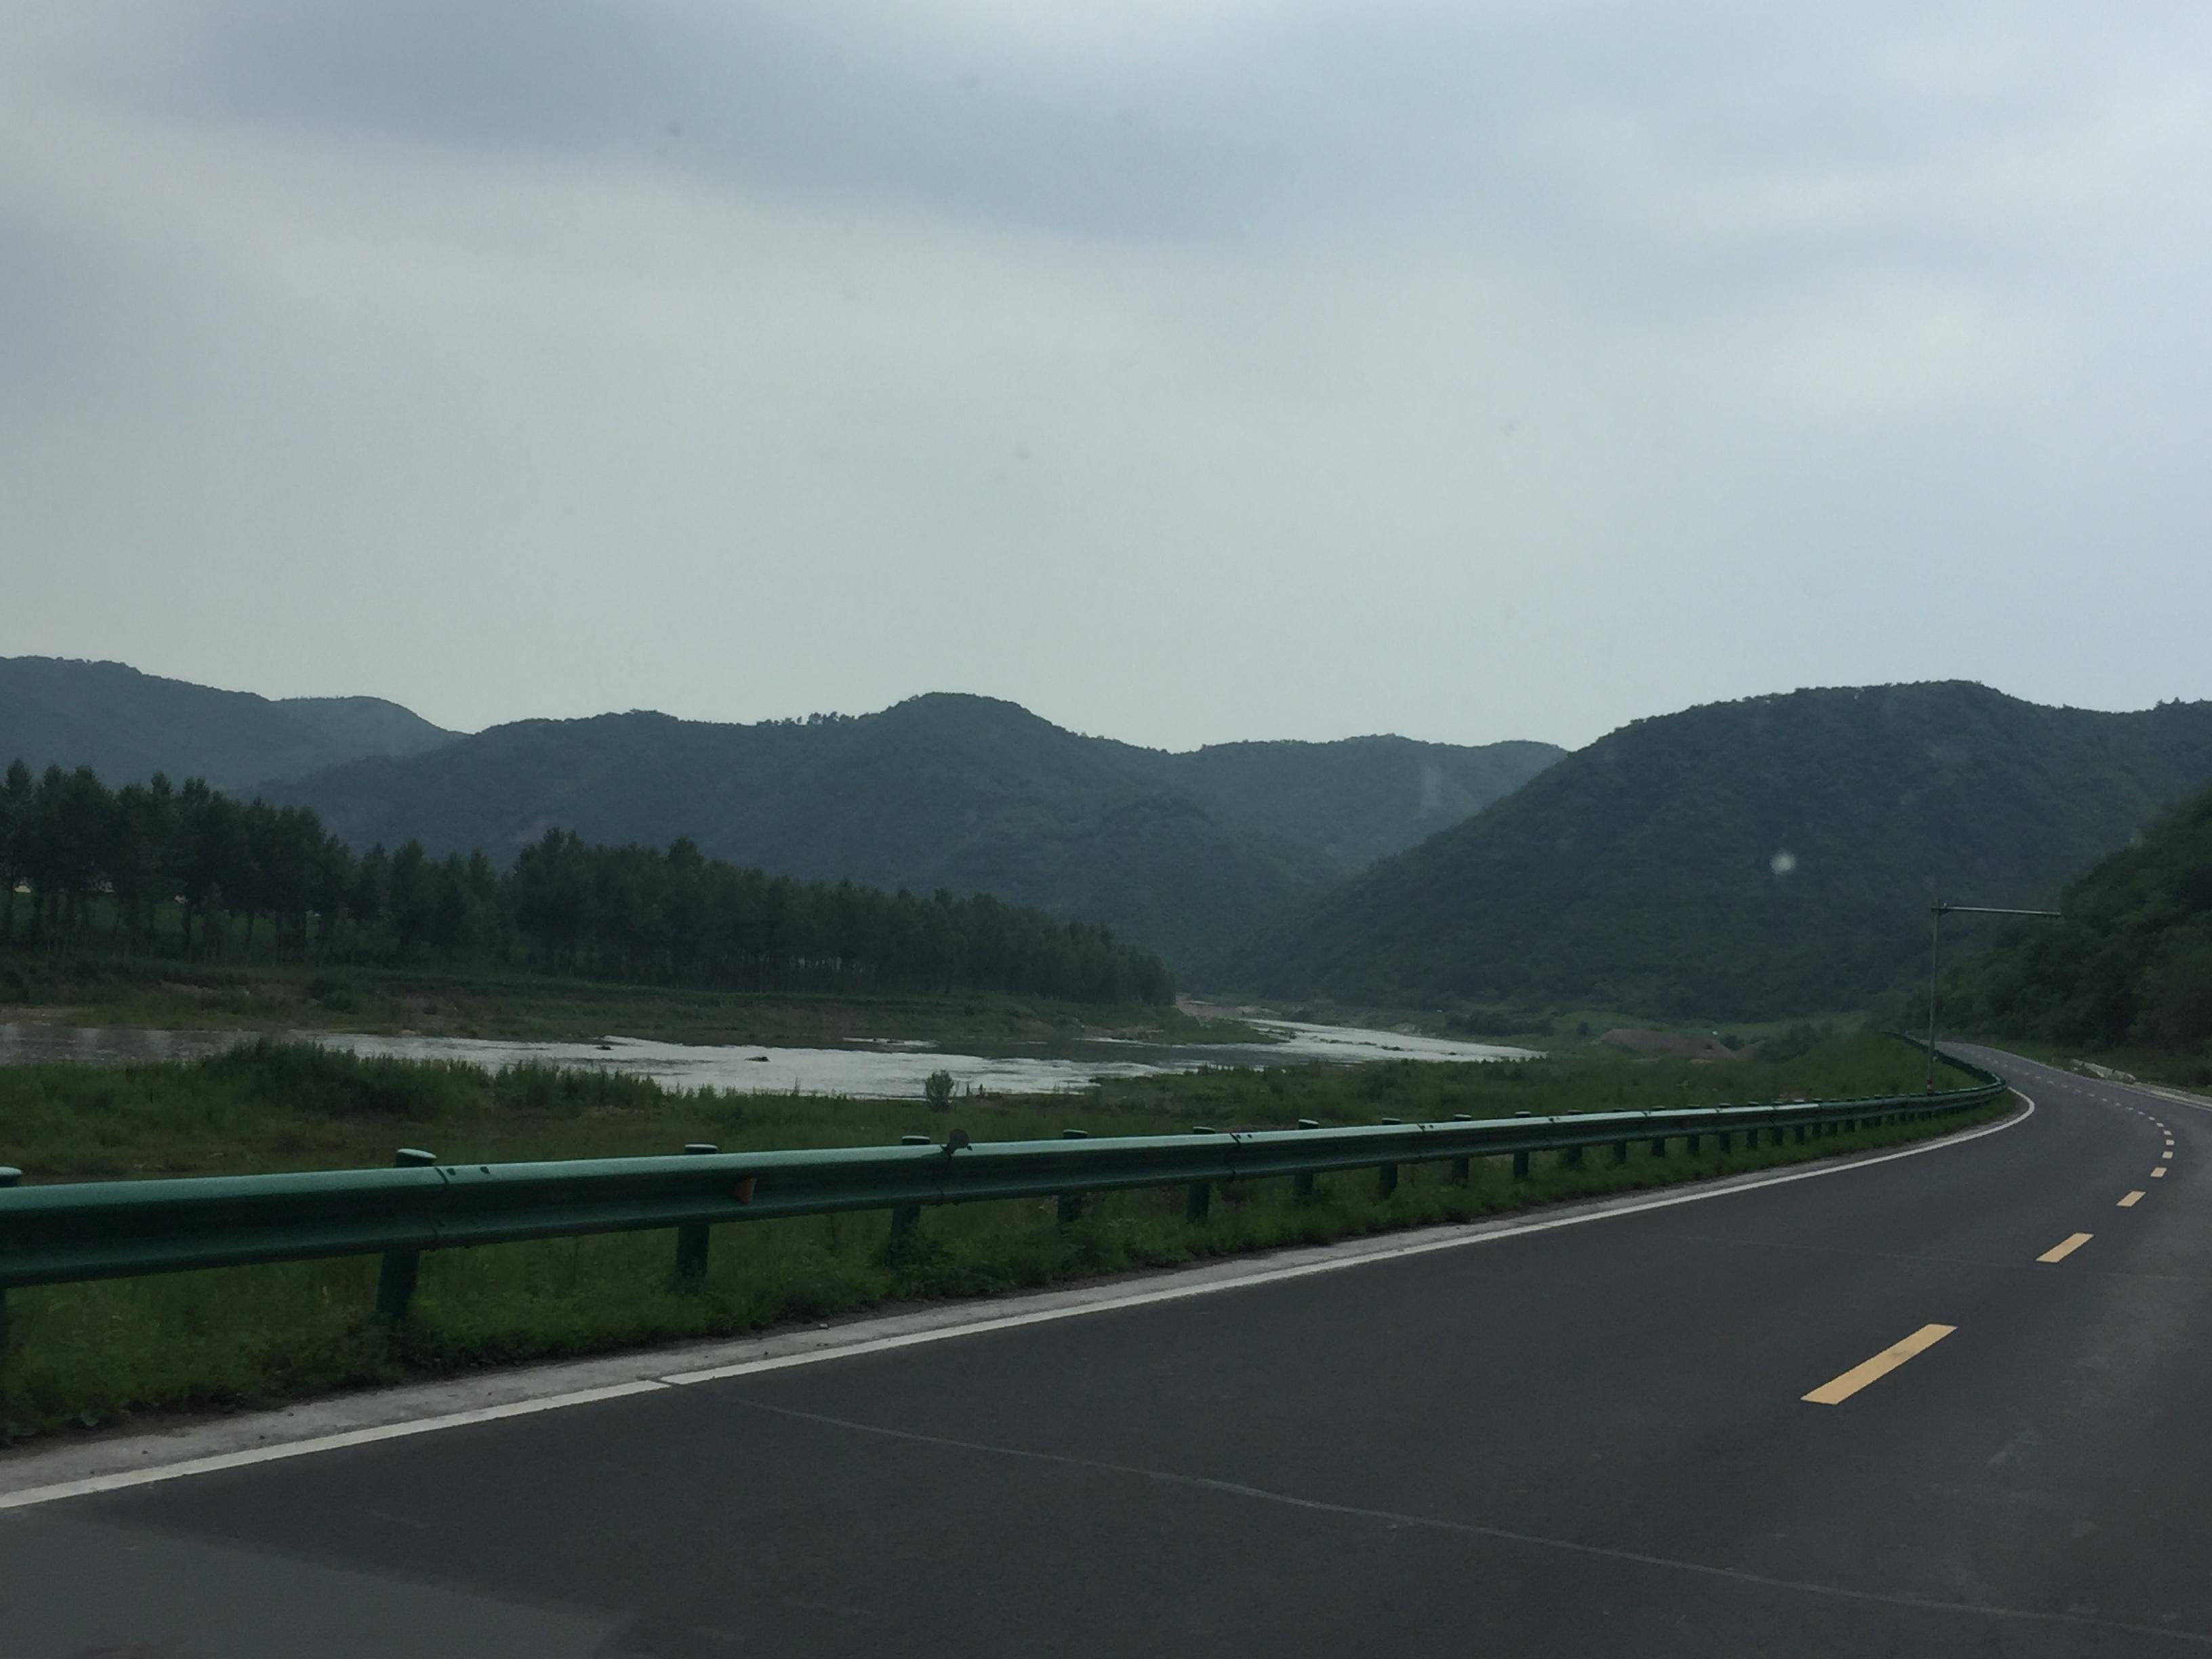 На том берегу реки Гаяхе уже Северная Корея